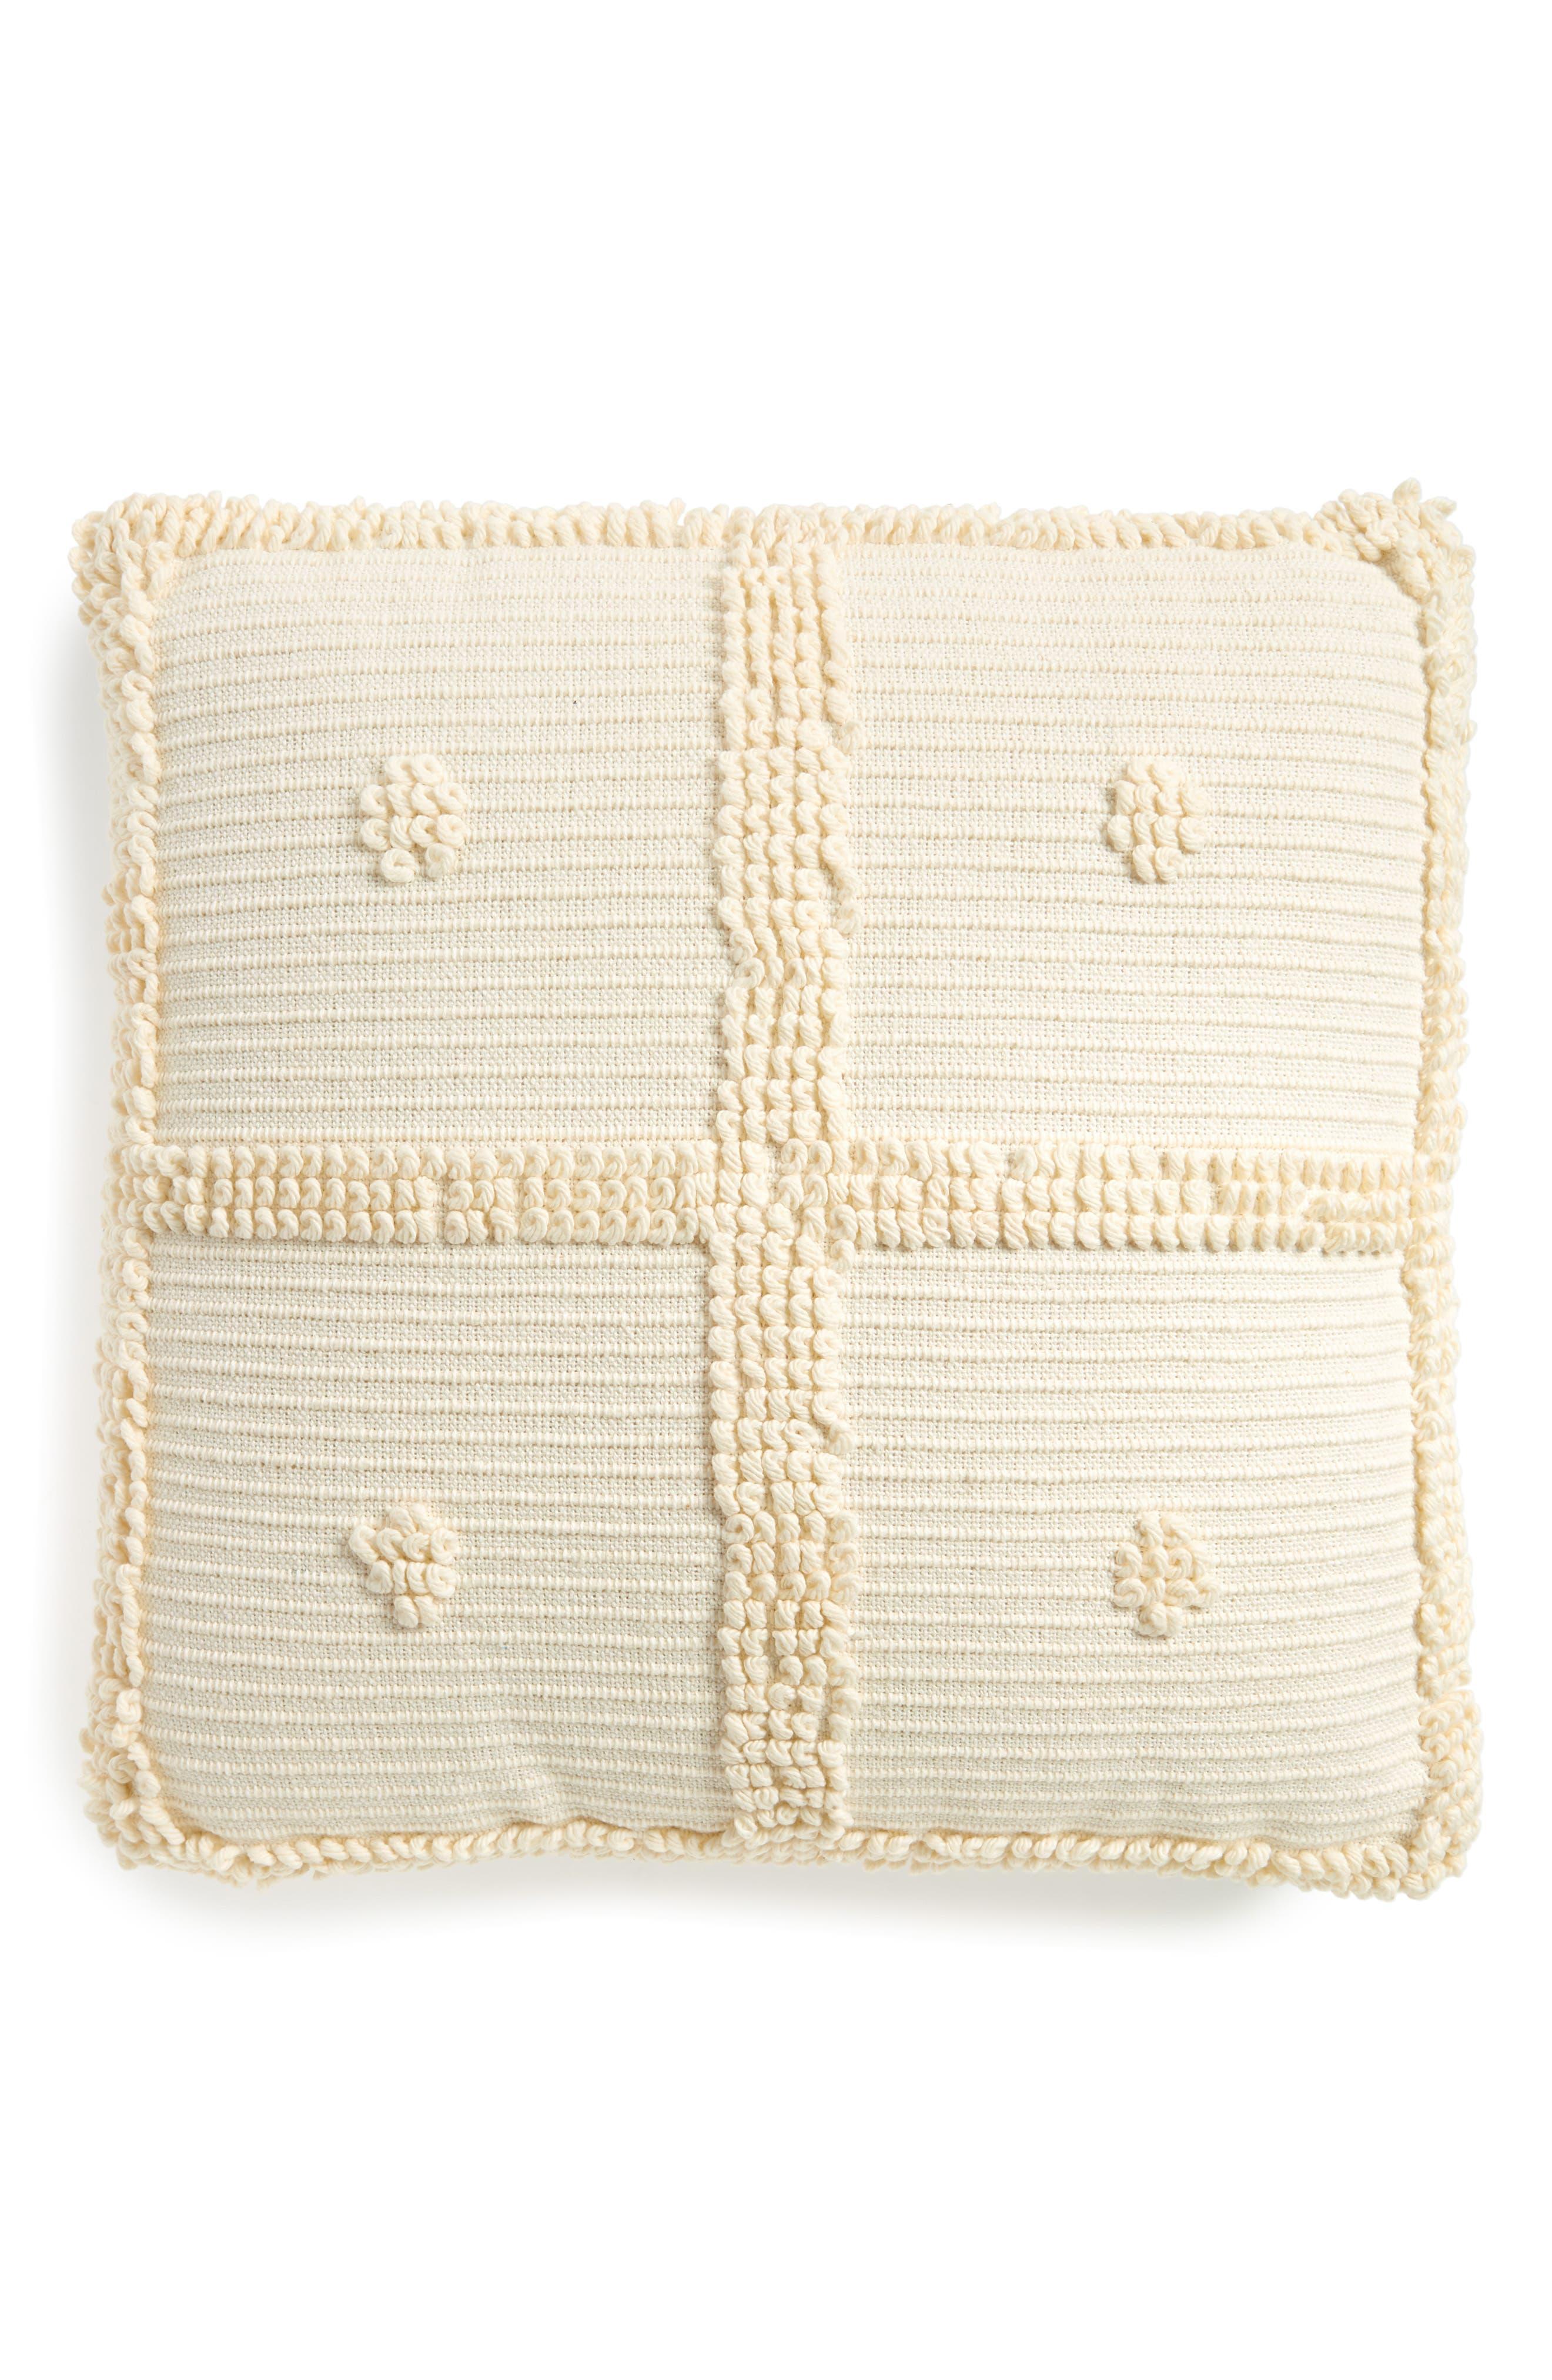 Square Accent Pillow,                             Main thumbnail 1, color,                             100